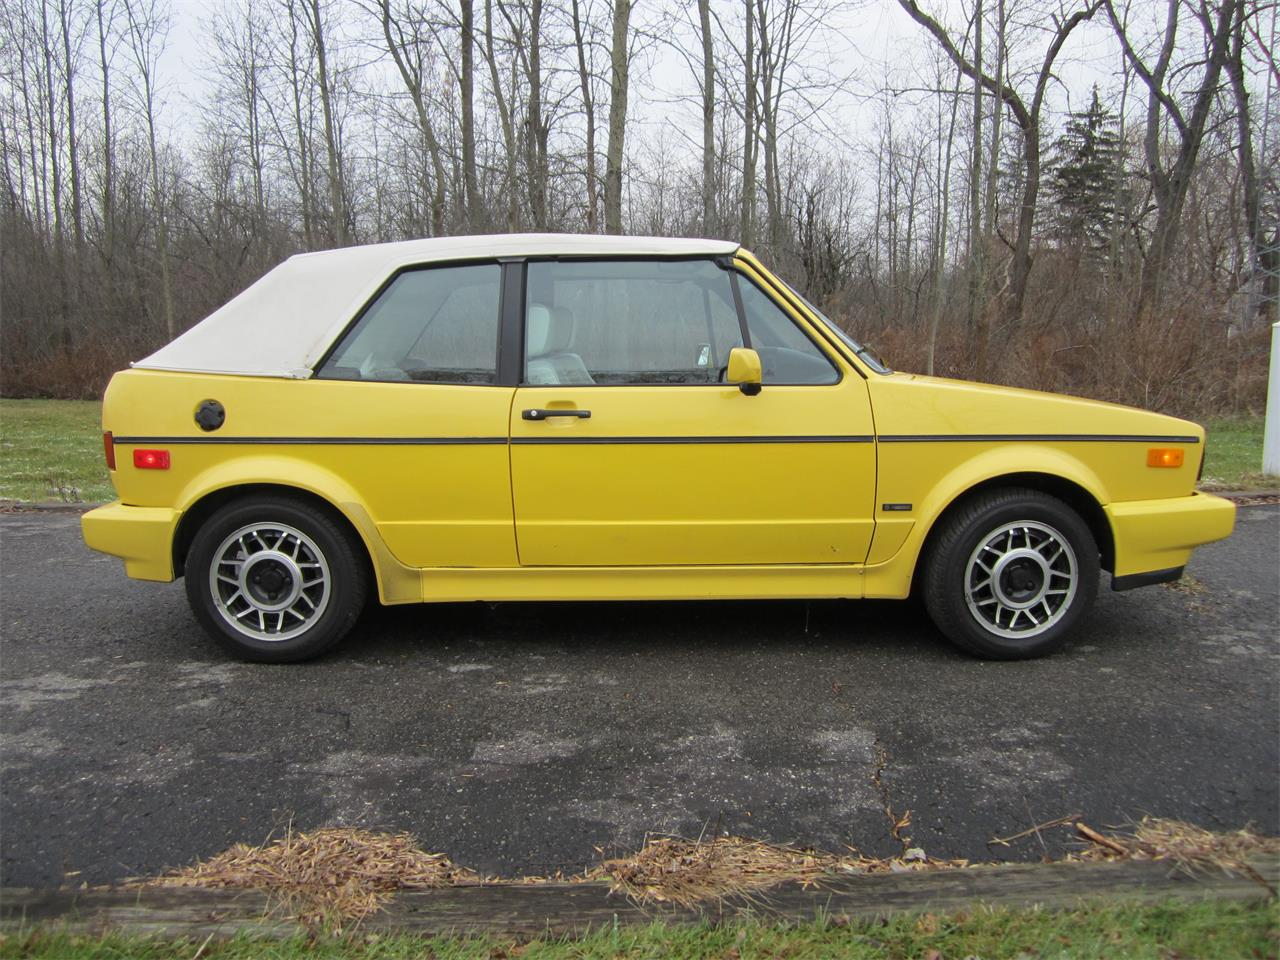 Large Picture of 1991 Volkswagen Cabriolet - $15,000.00 - JGCG